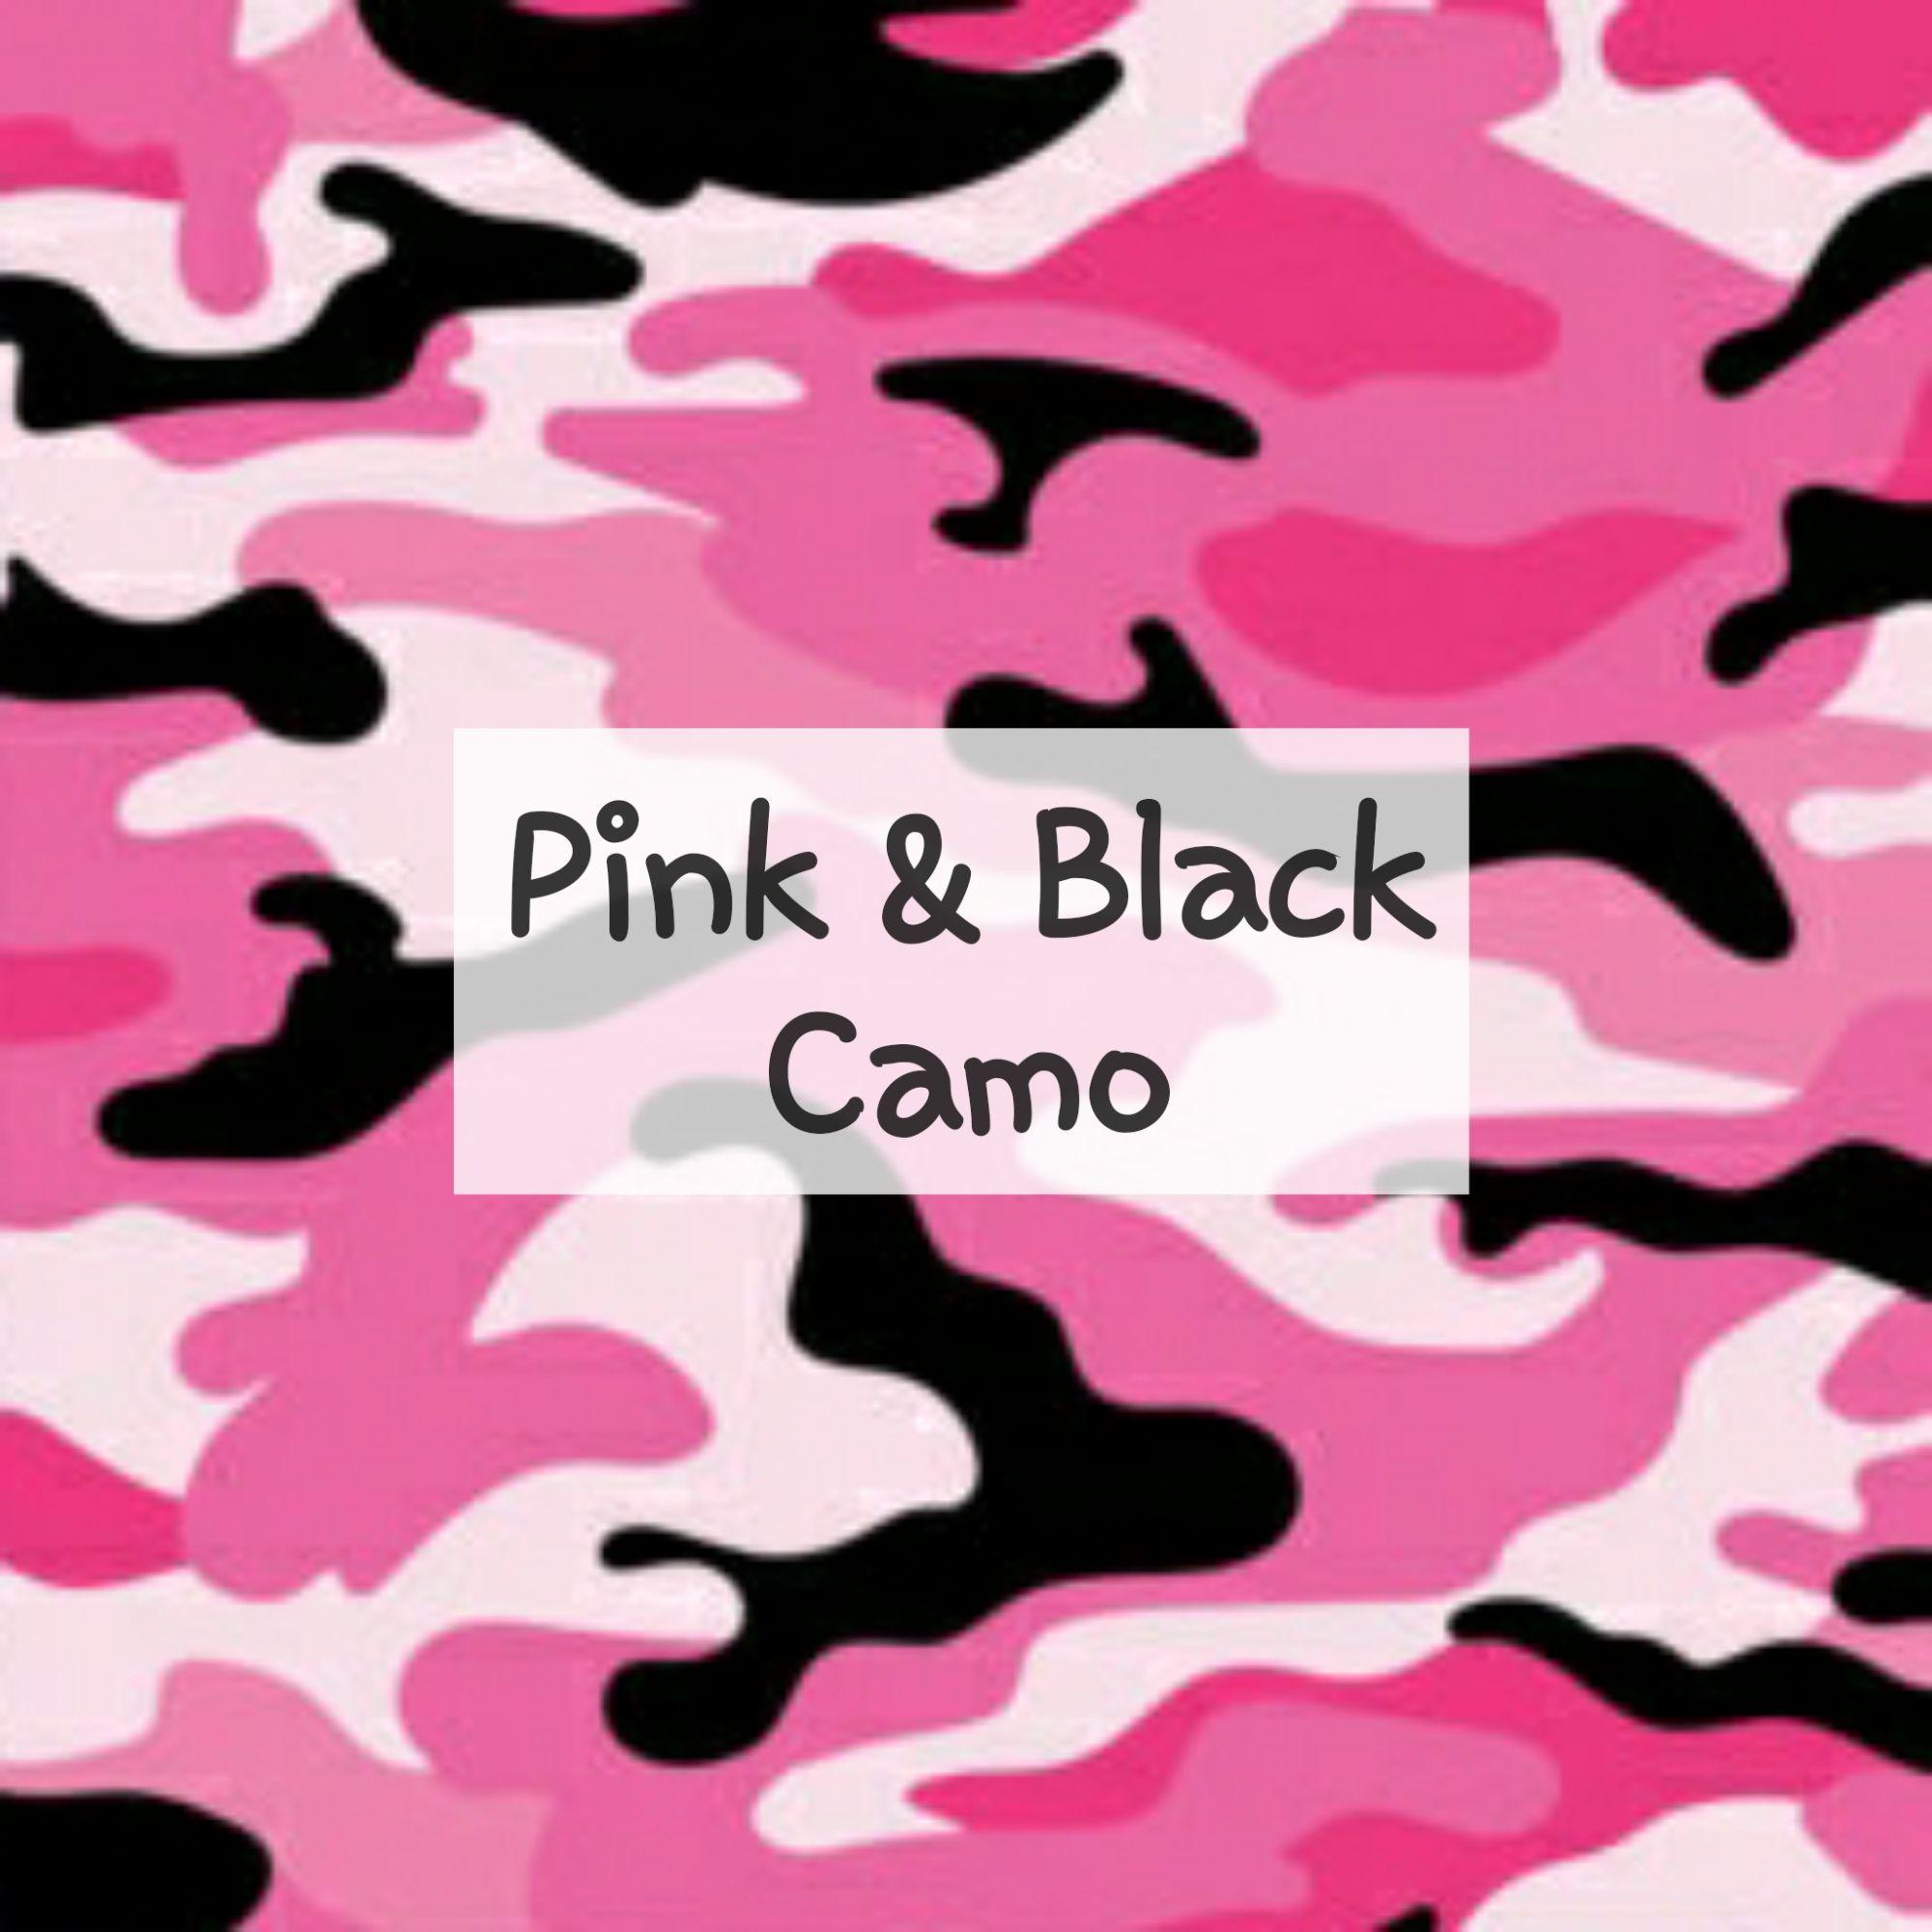 Pink & Black Camo